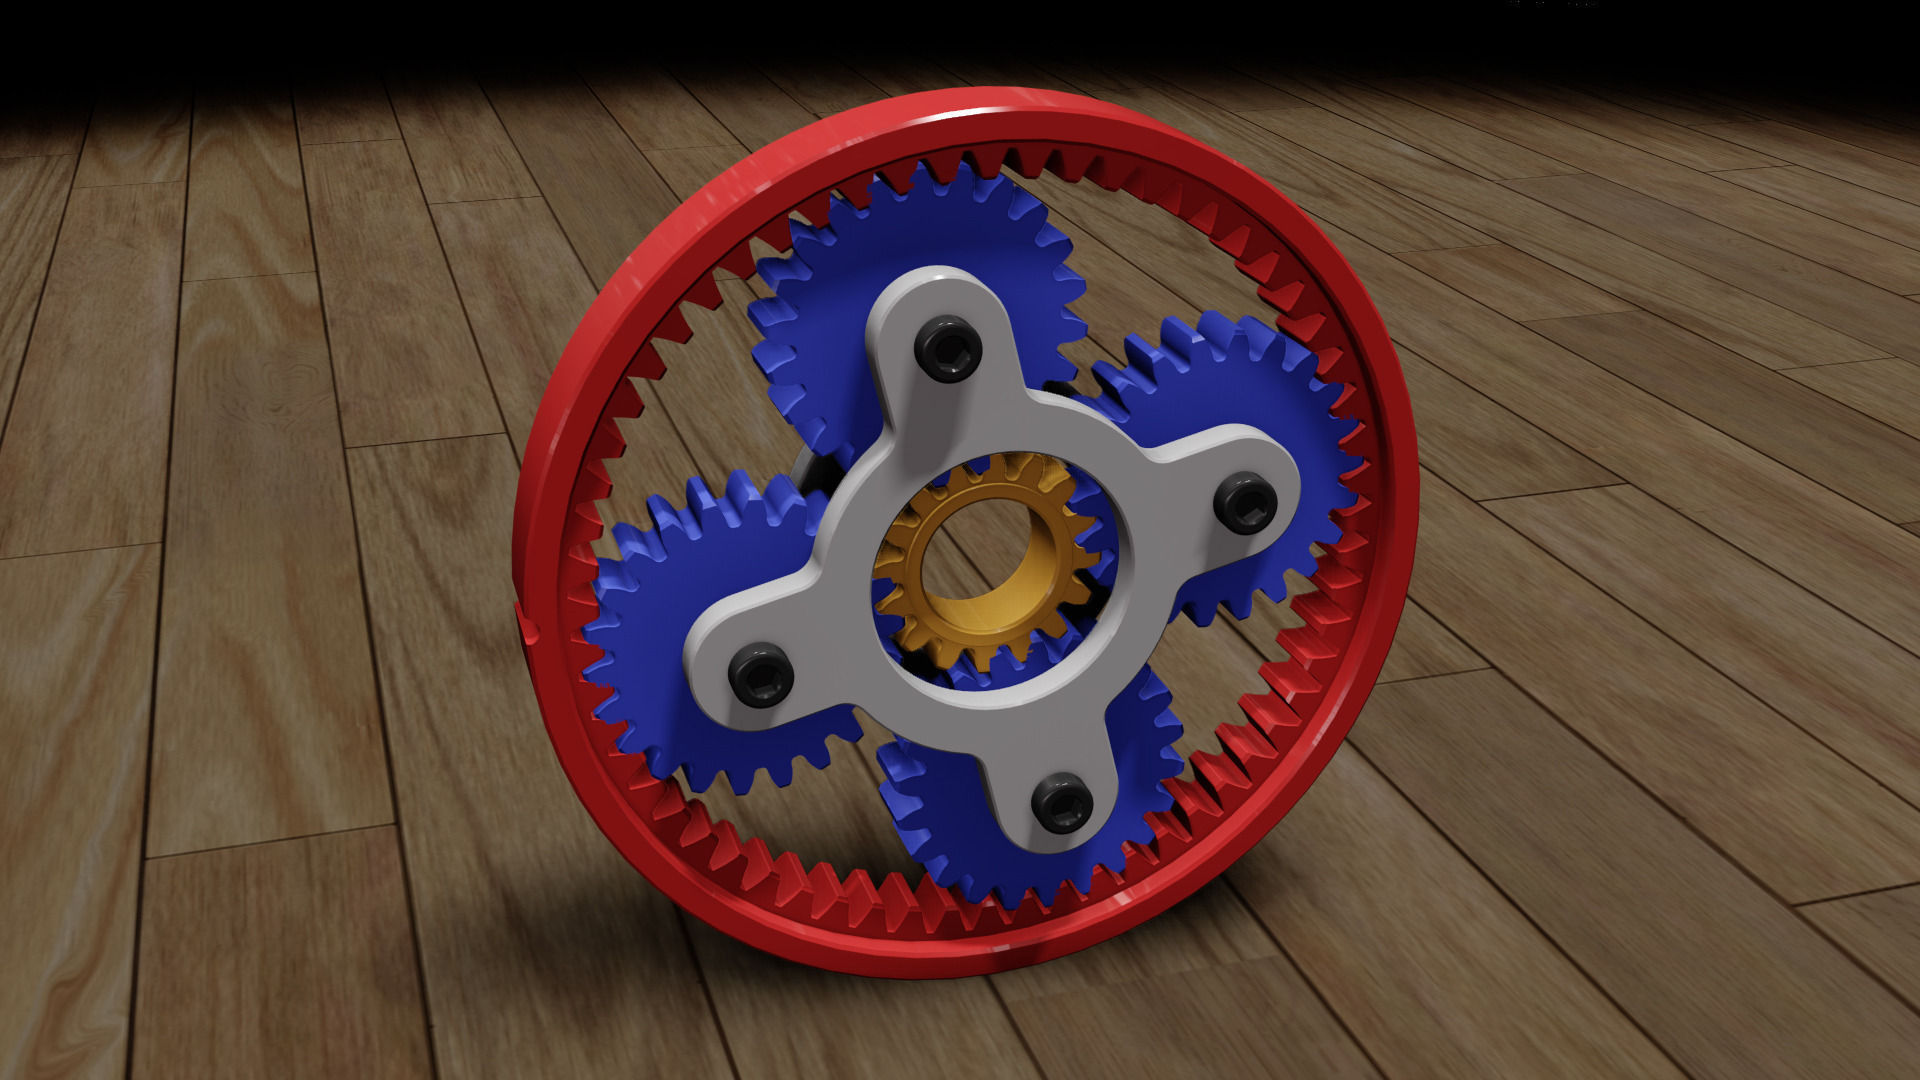 Planetary Gear Animation SW Files Free 3D Model Obj